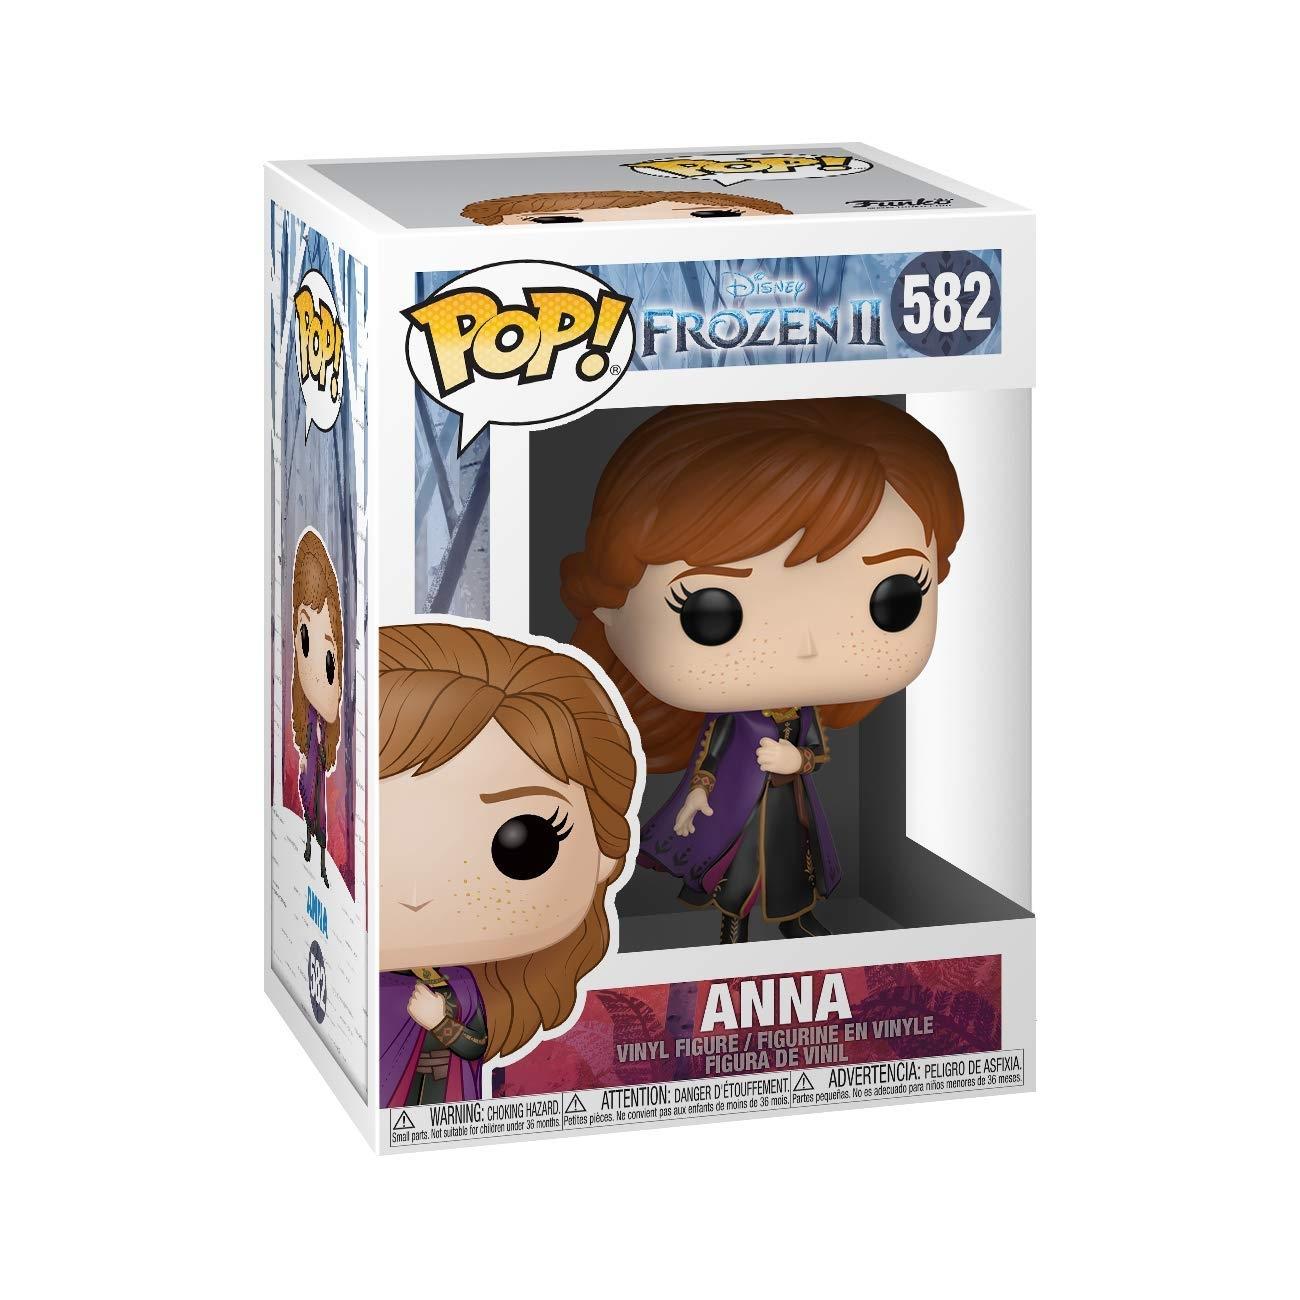 POP Disney Frozen 2 Anna Pop Vinyl: Ornament